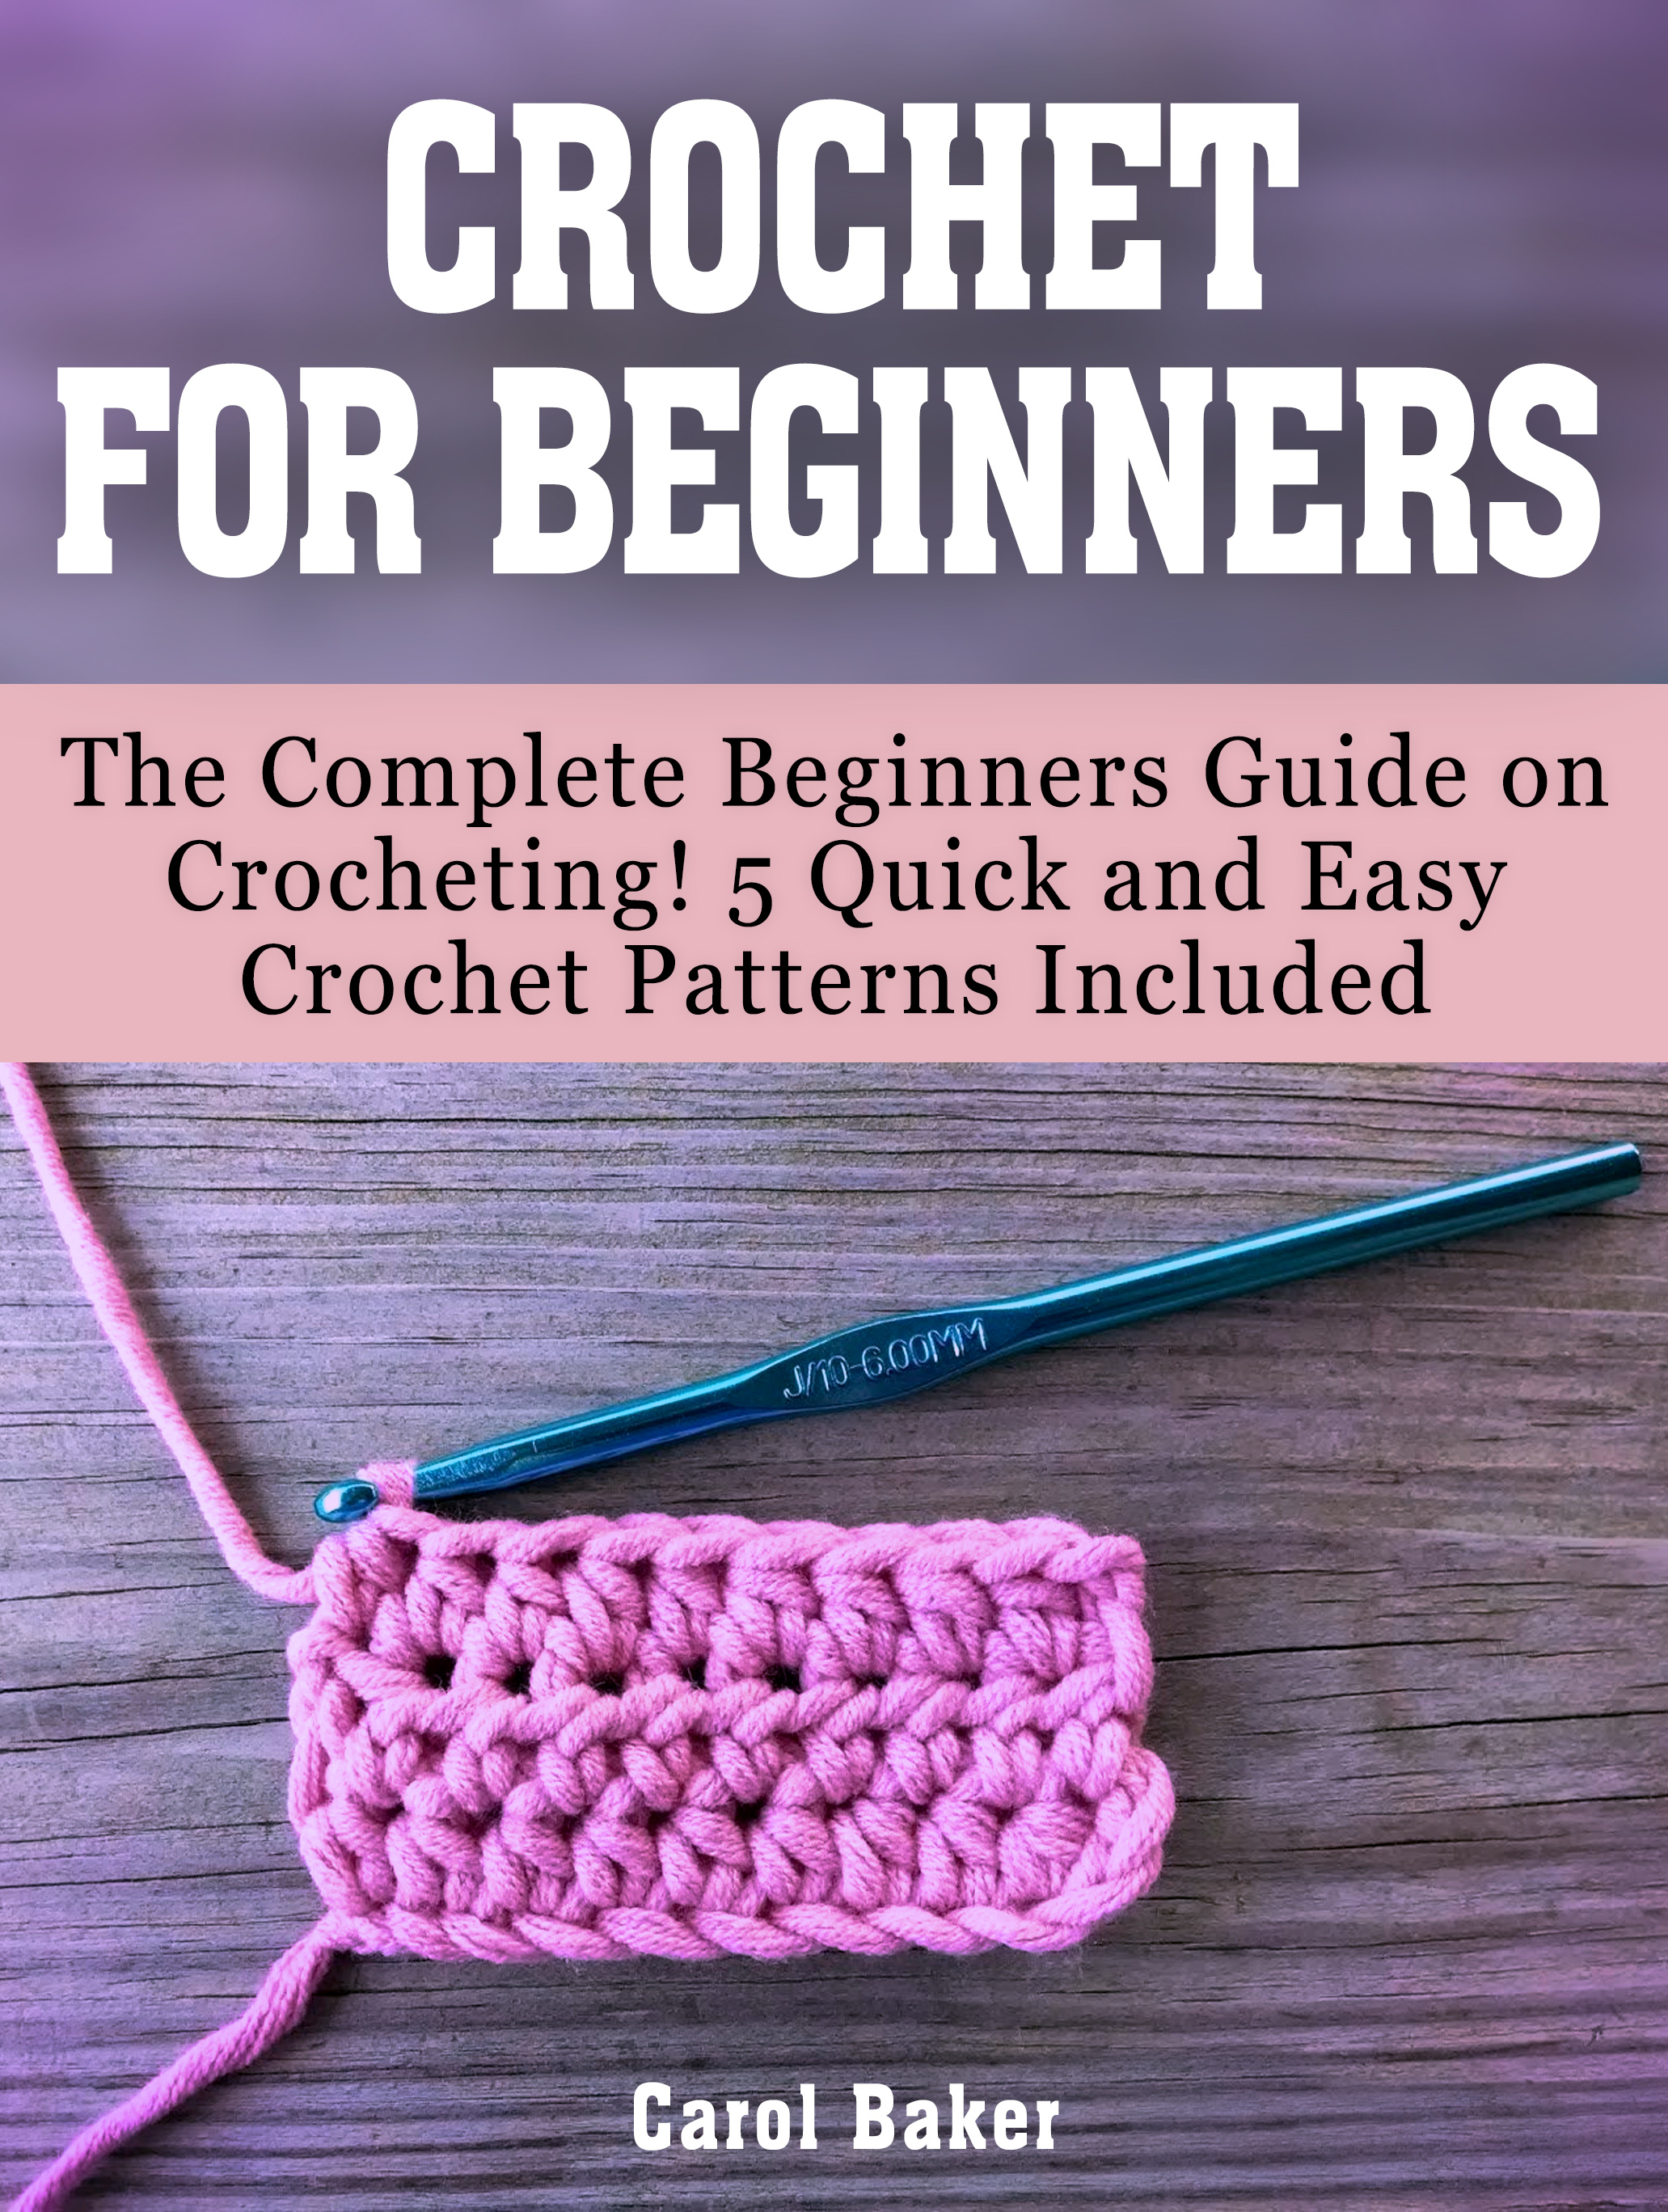 Smashwords Crochet For Beginners The Complete Beginners Guide On